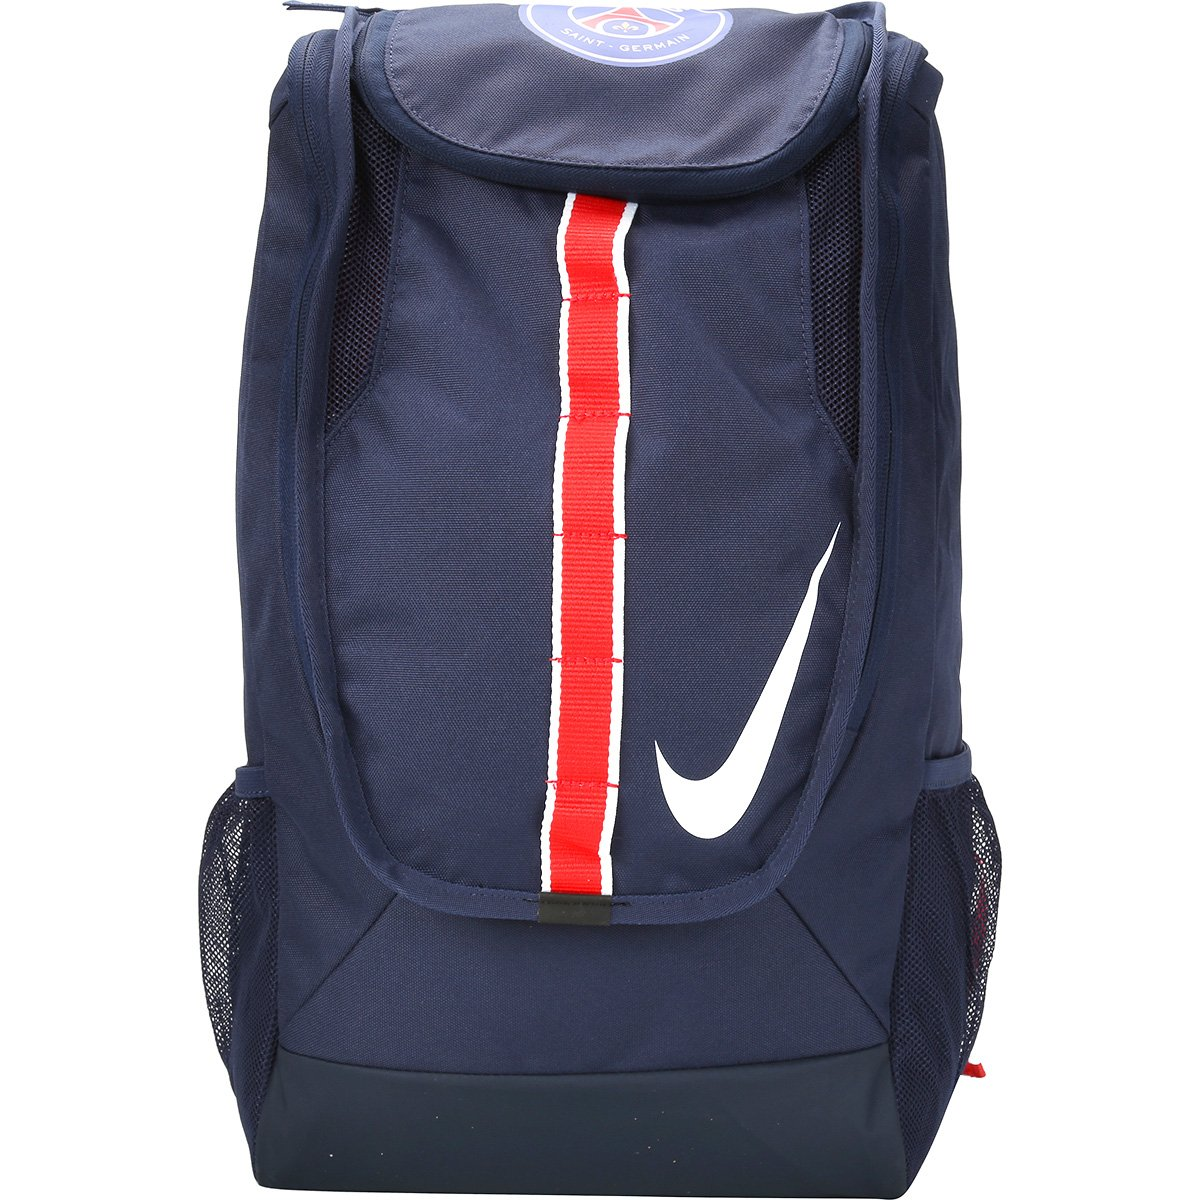 04073a395 Mochila Nike Paris Saint Germain Allegiance Shield Compact - Compre Agora |  Netshoes